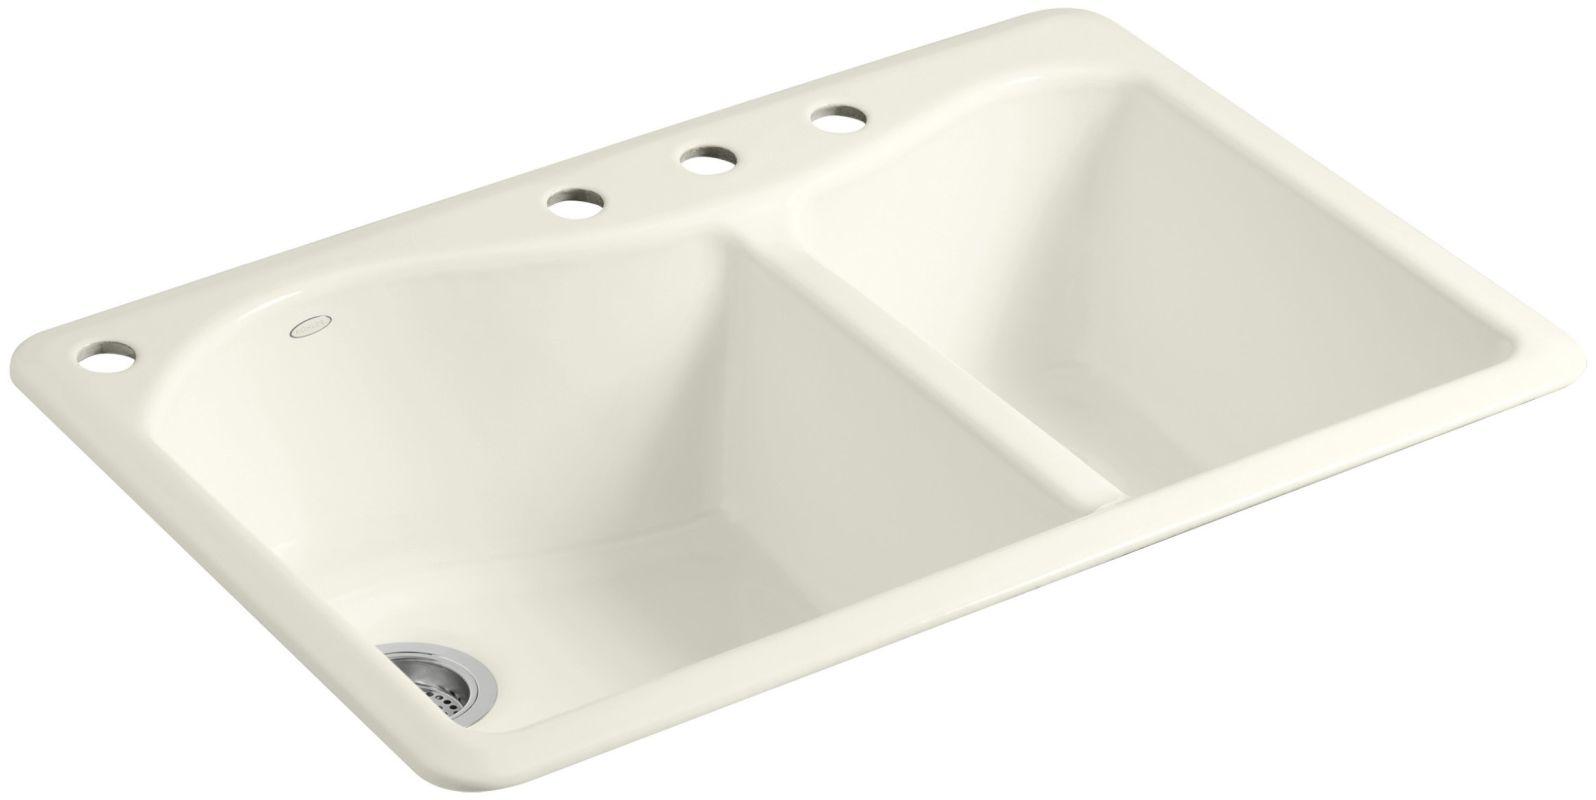 Undermount Kitchen Sink With Faucet Holes Kohler K 5841 4 96 Biscuit Lawnfield 33 Quot Double Basin Top